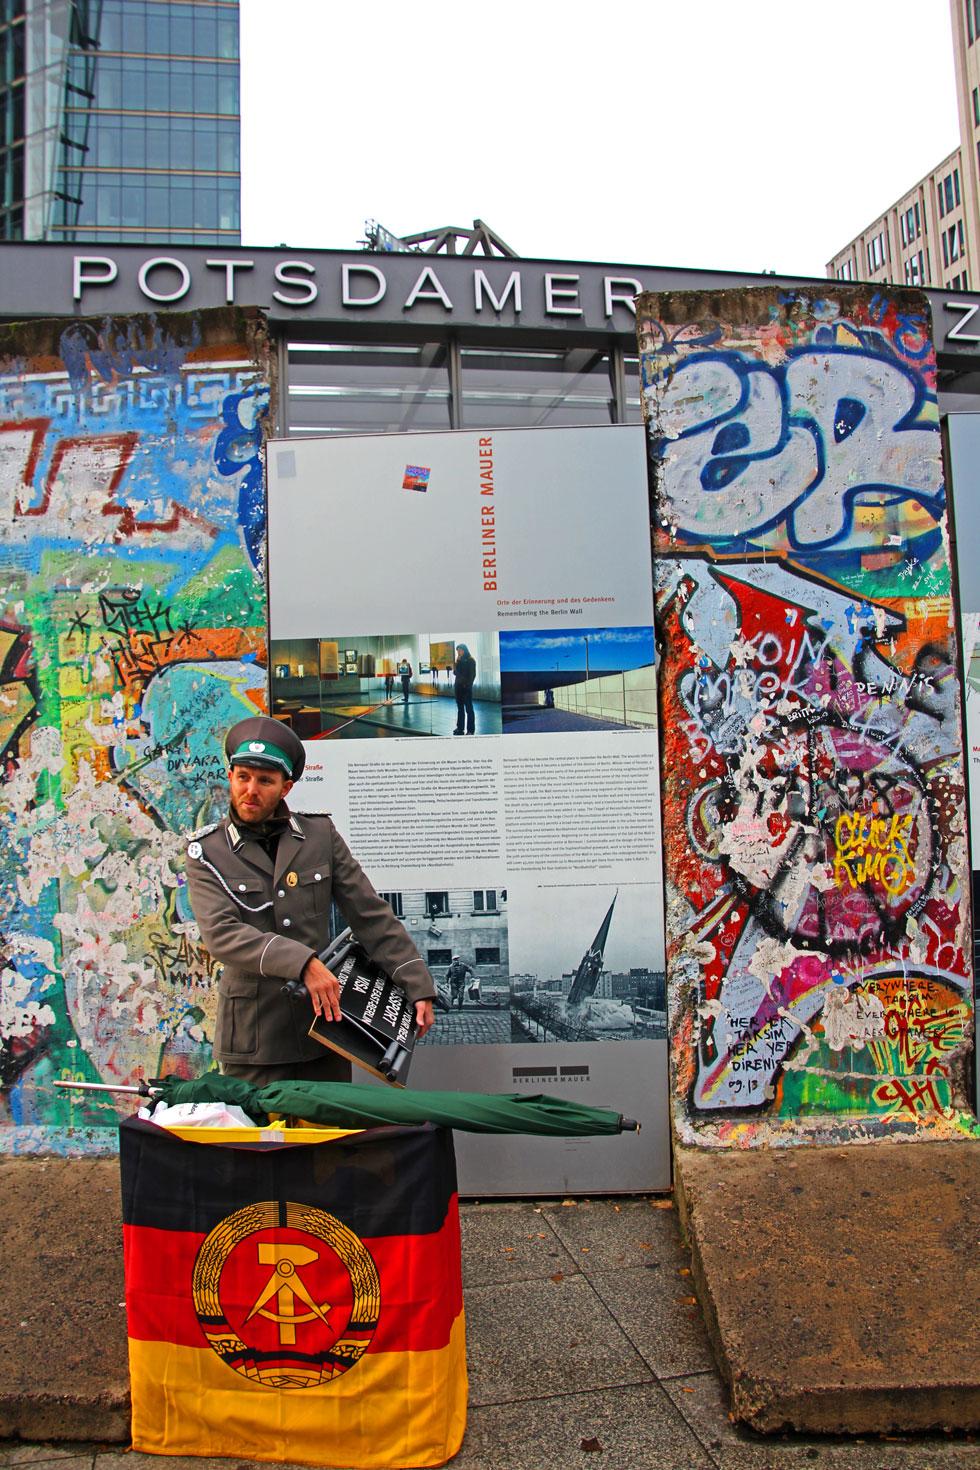 Original Wall that stands at Potsdam Platz